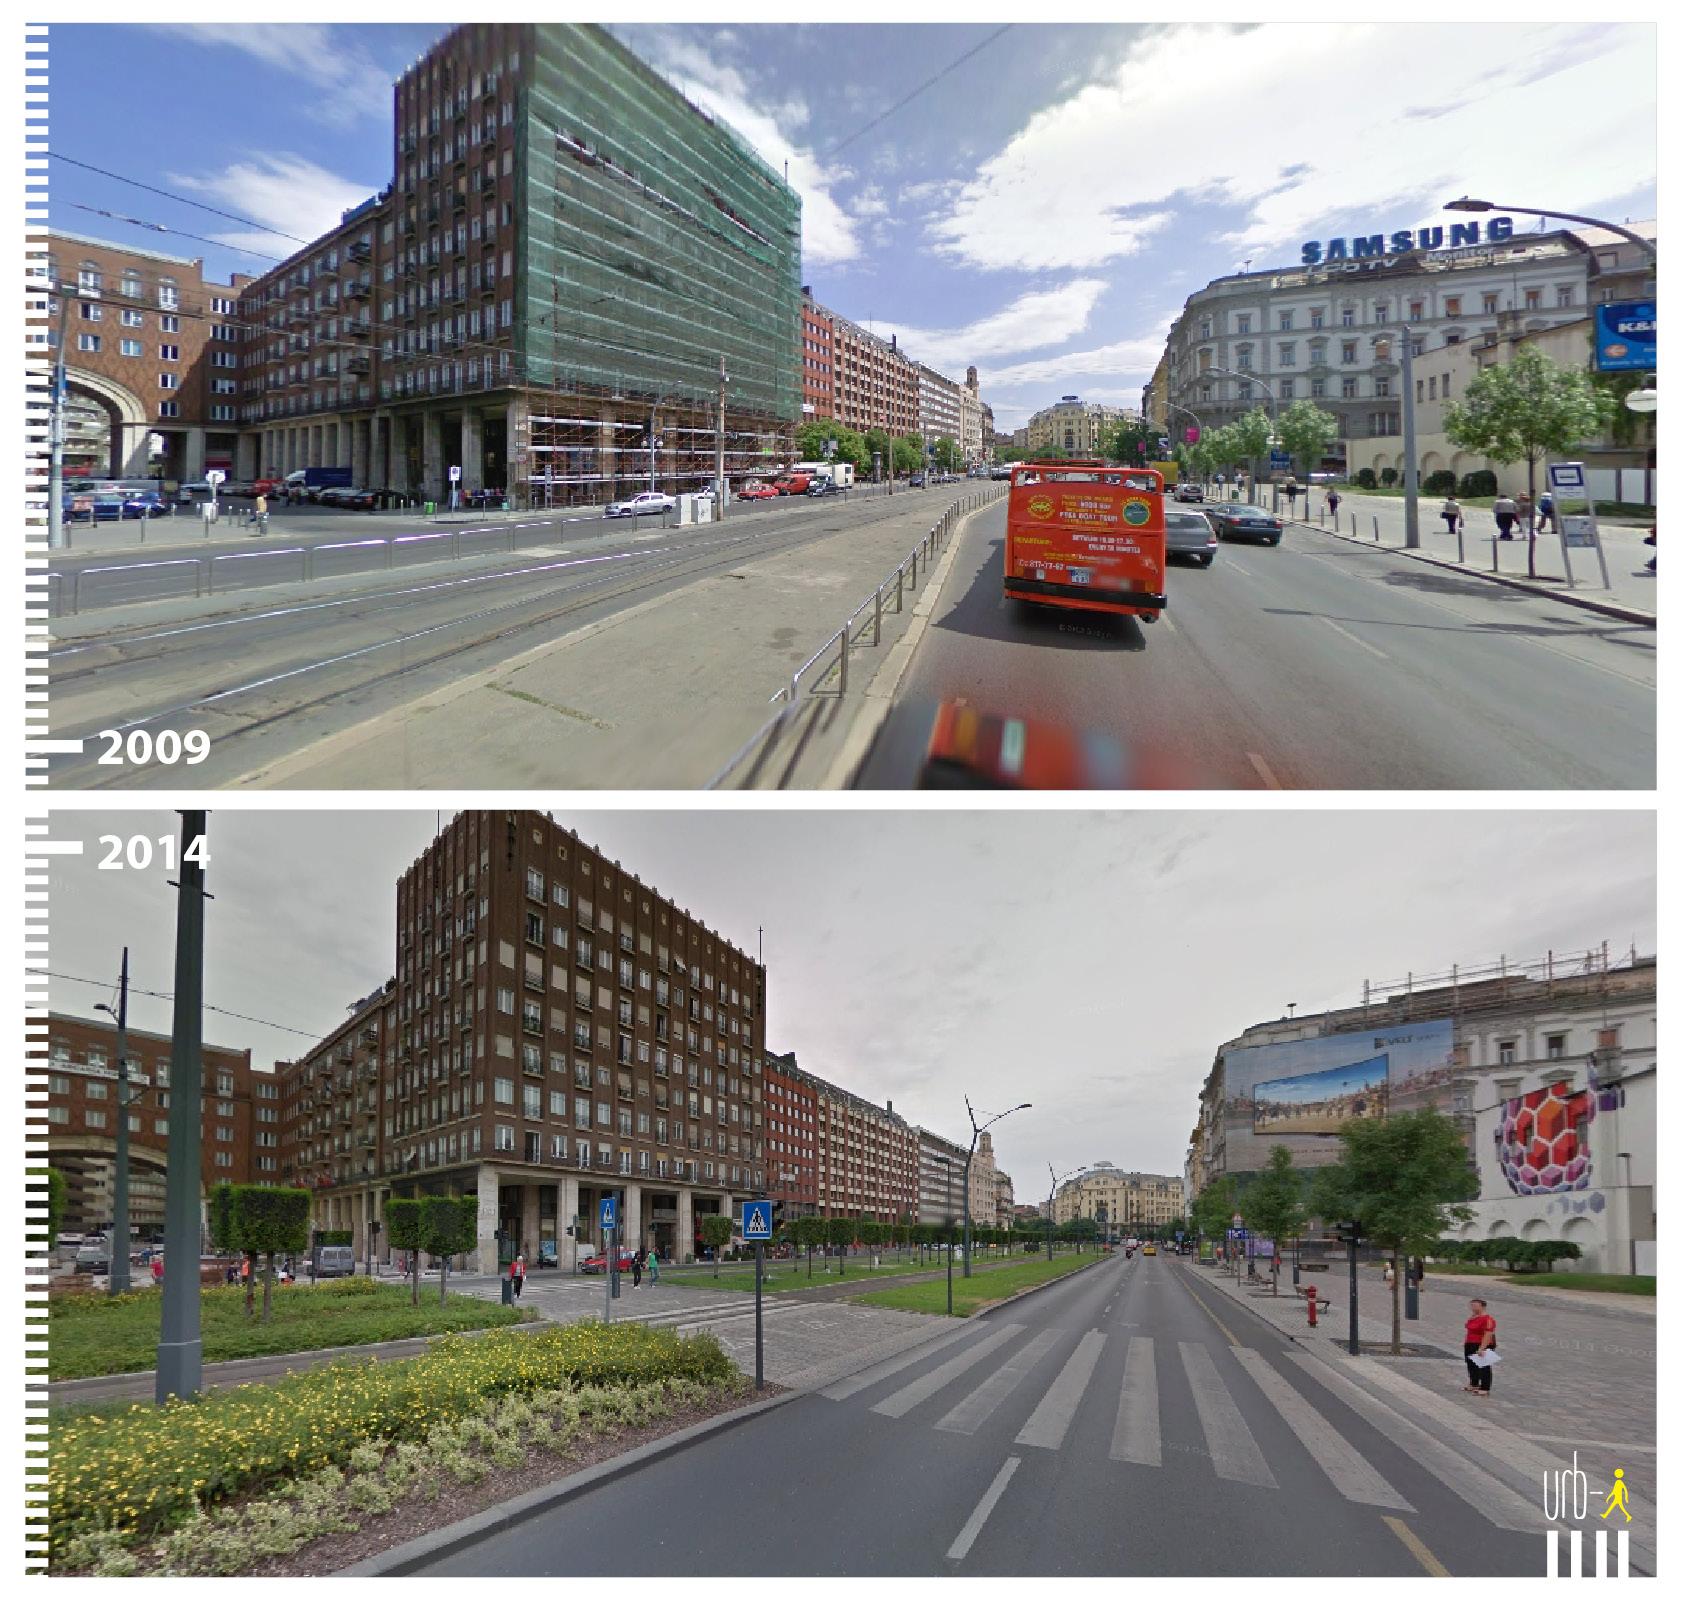 0207_HU_Budapest_Károly_krt